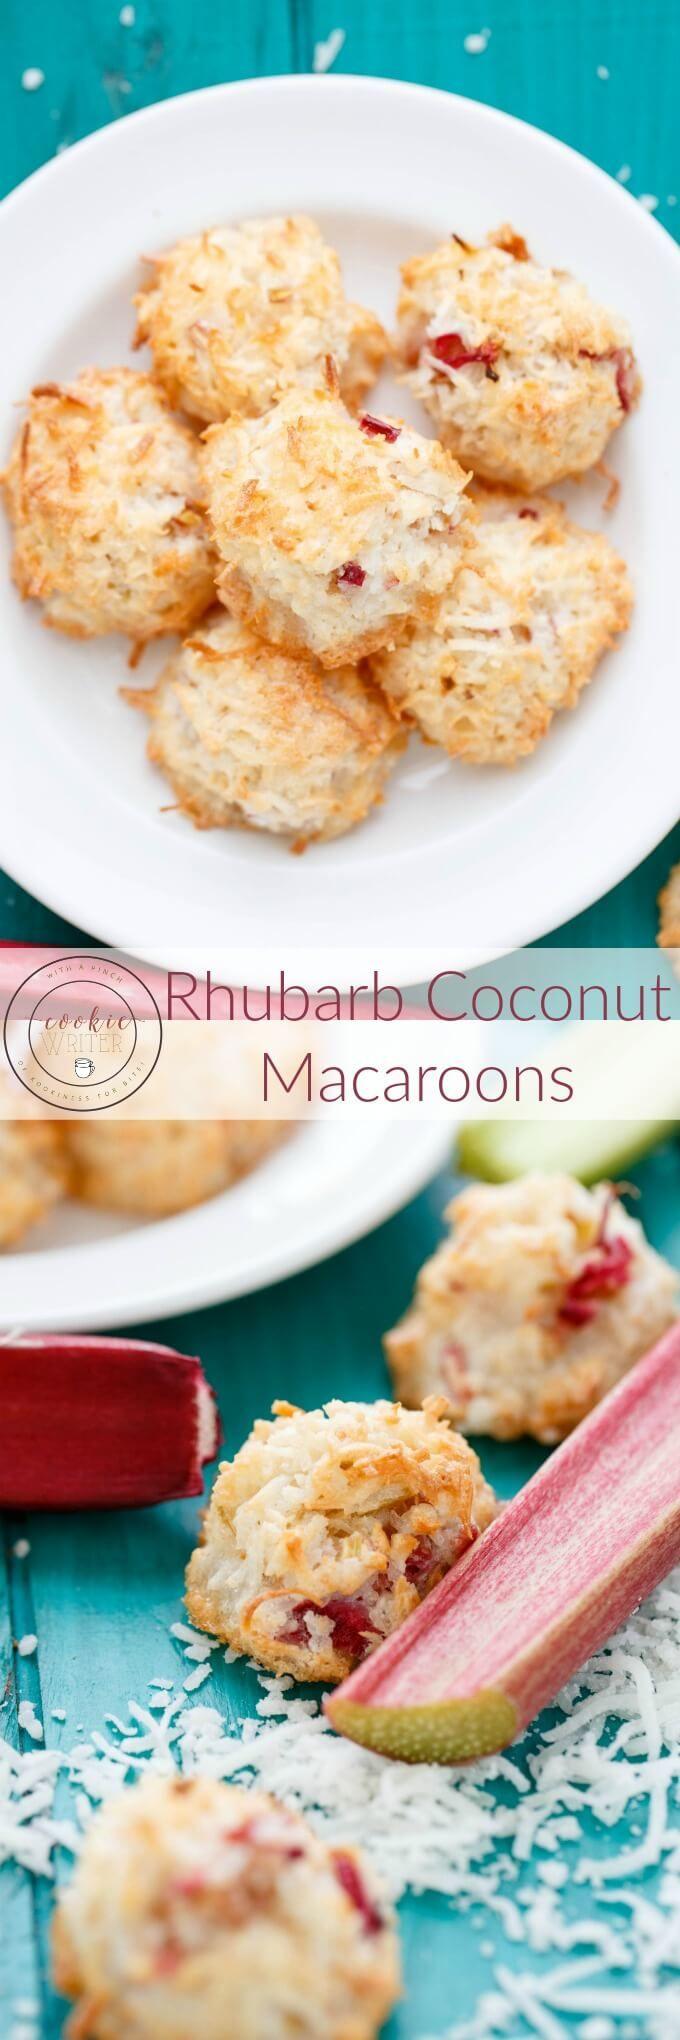 Rhubarb Coconut Macaroons